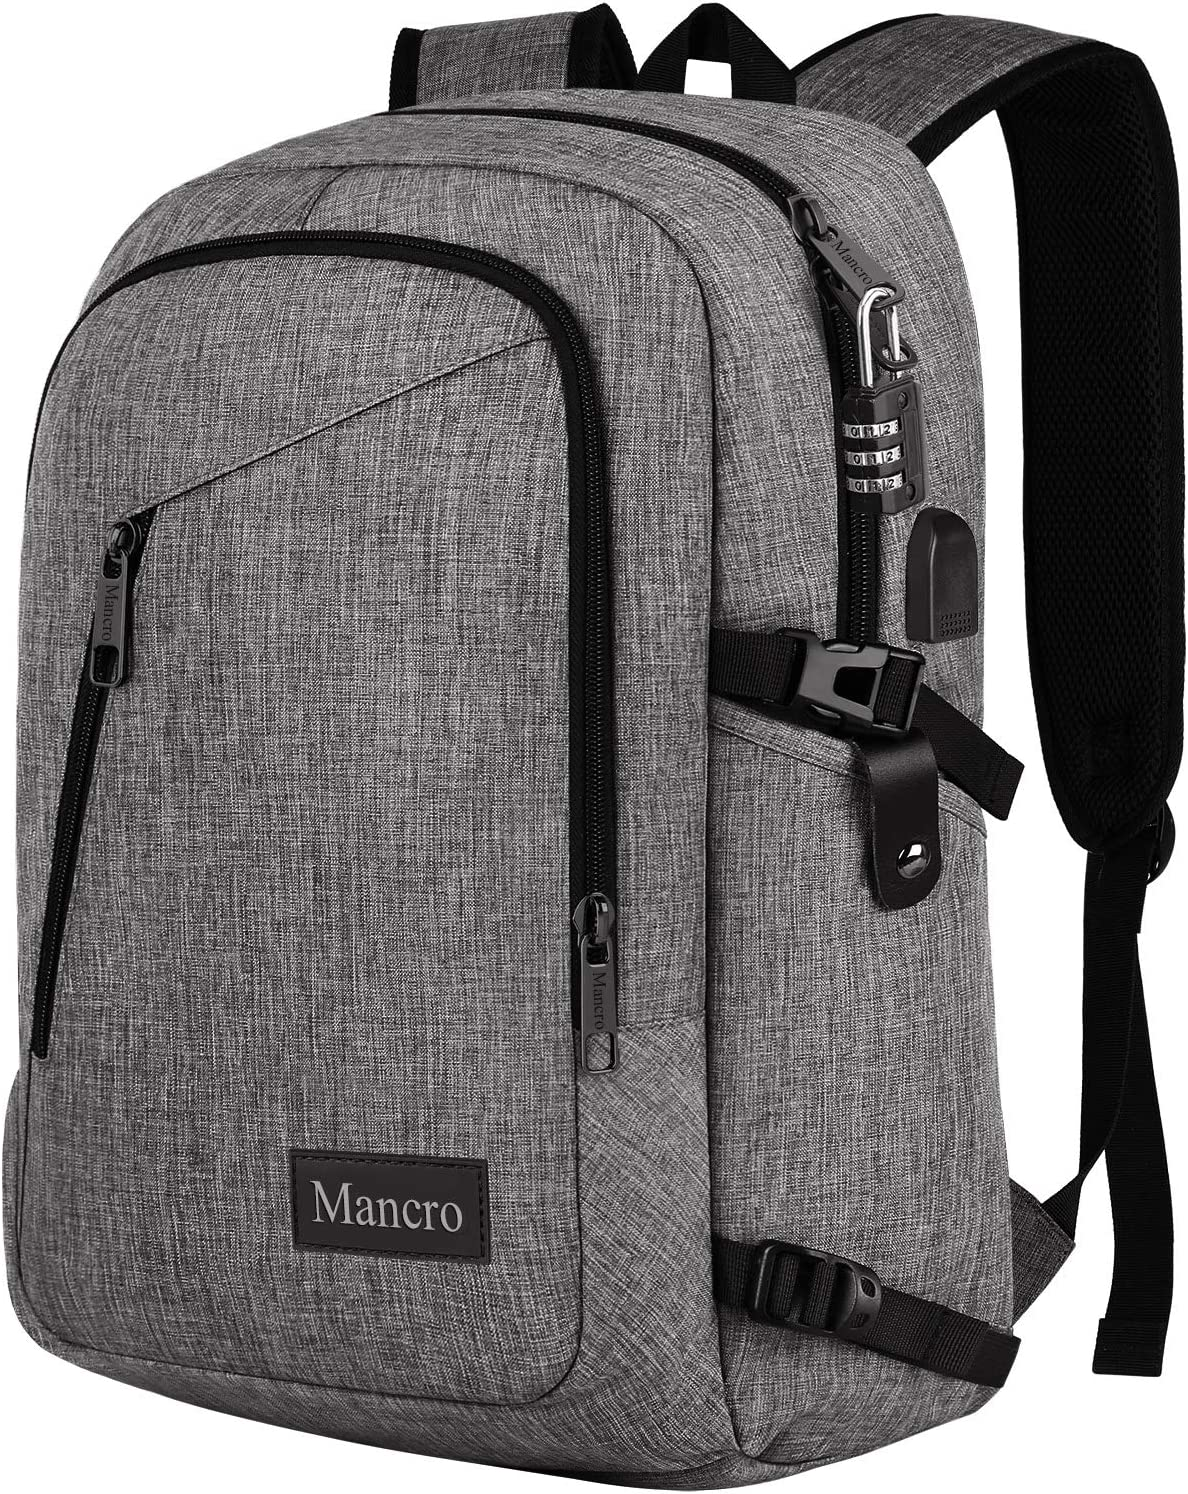 Laptop Backpack, Travel Computer Bag for Women & Men,